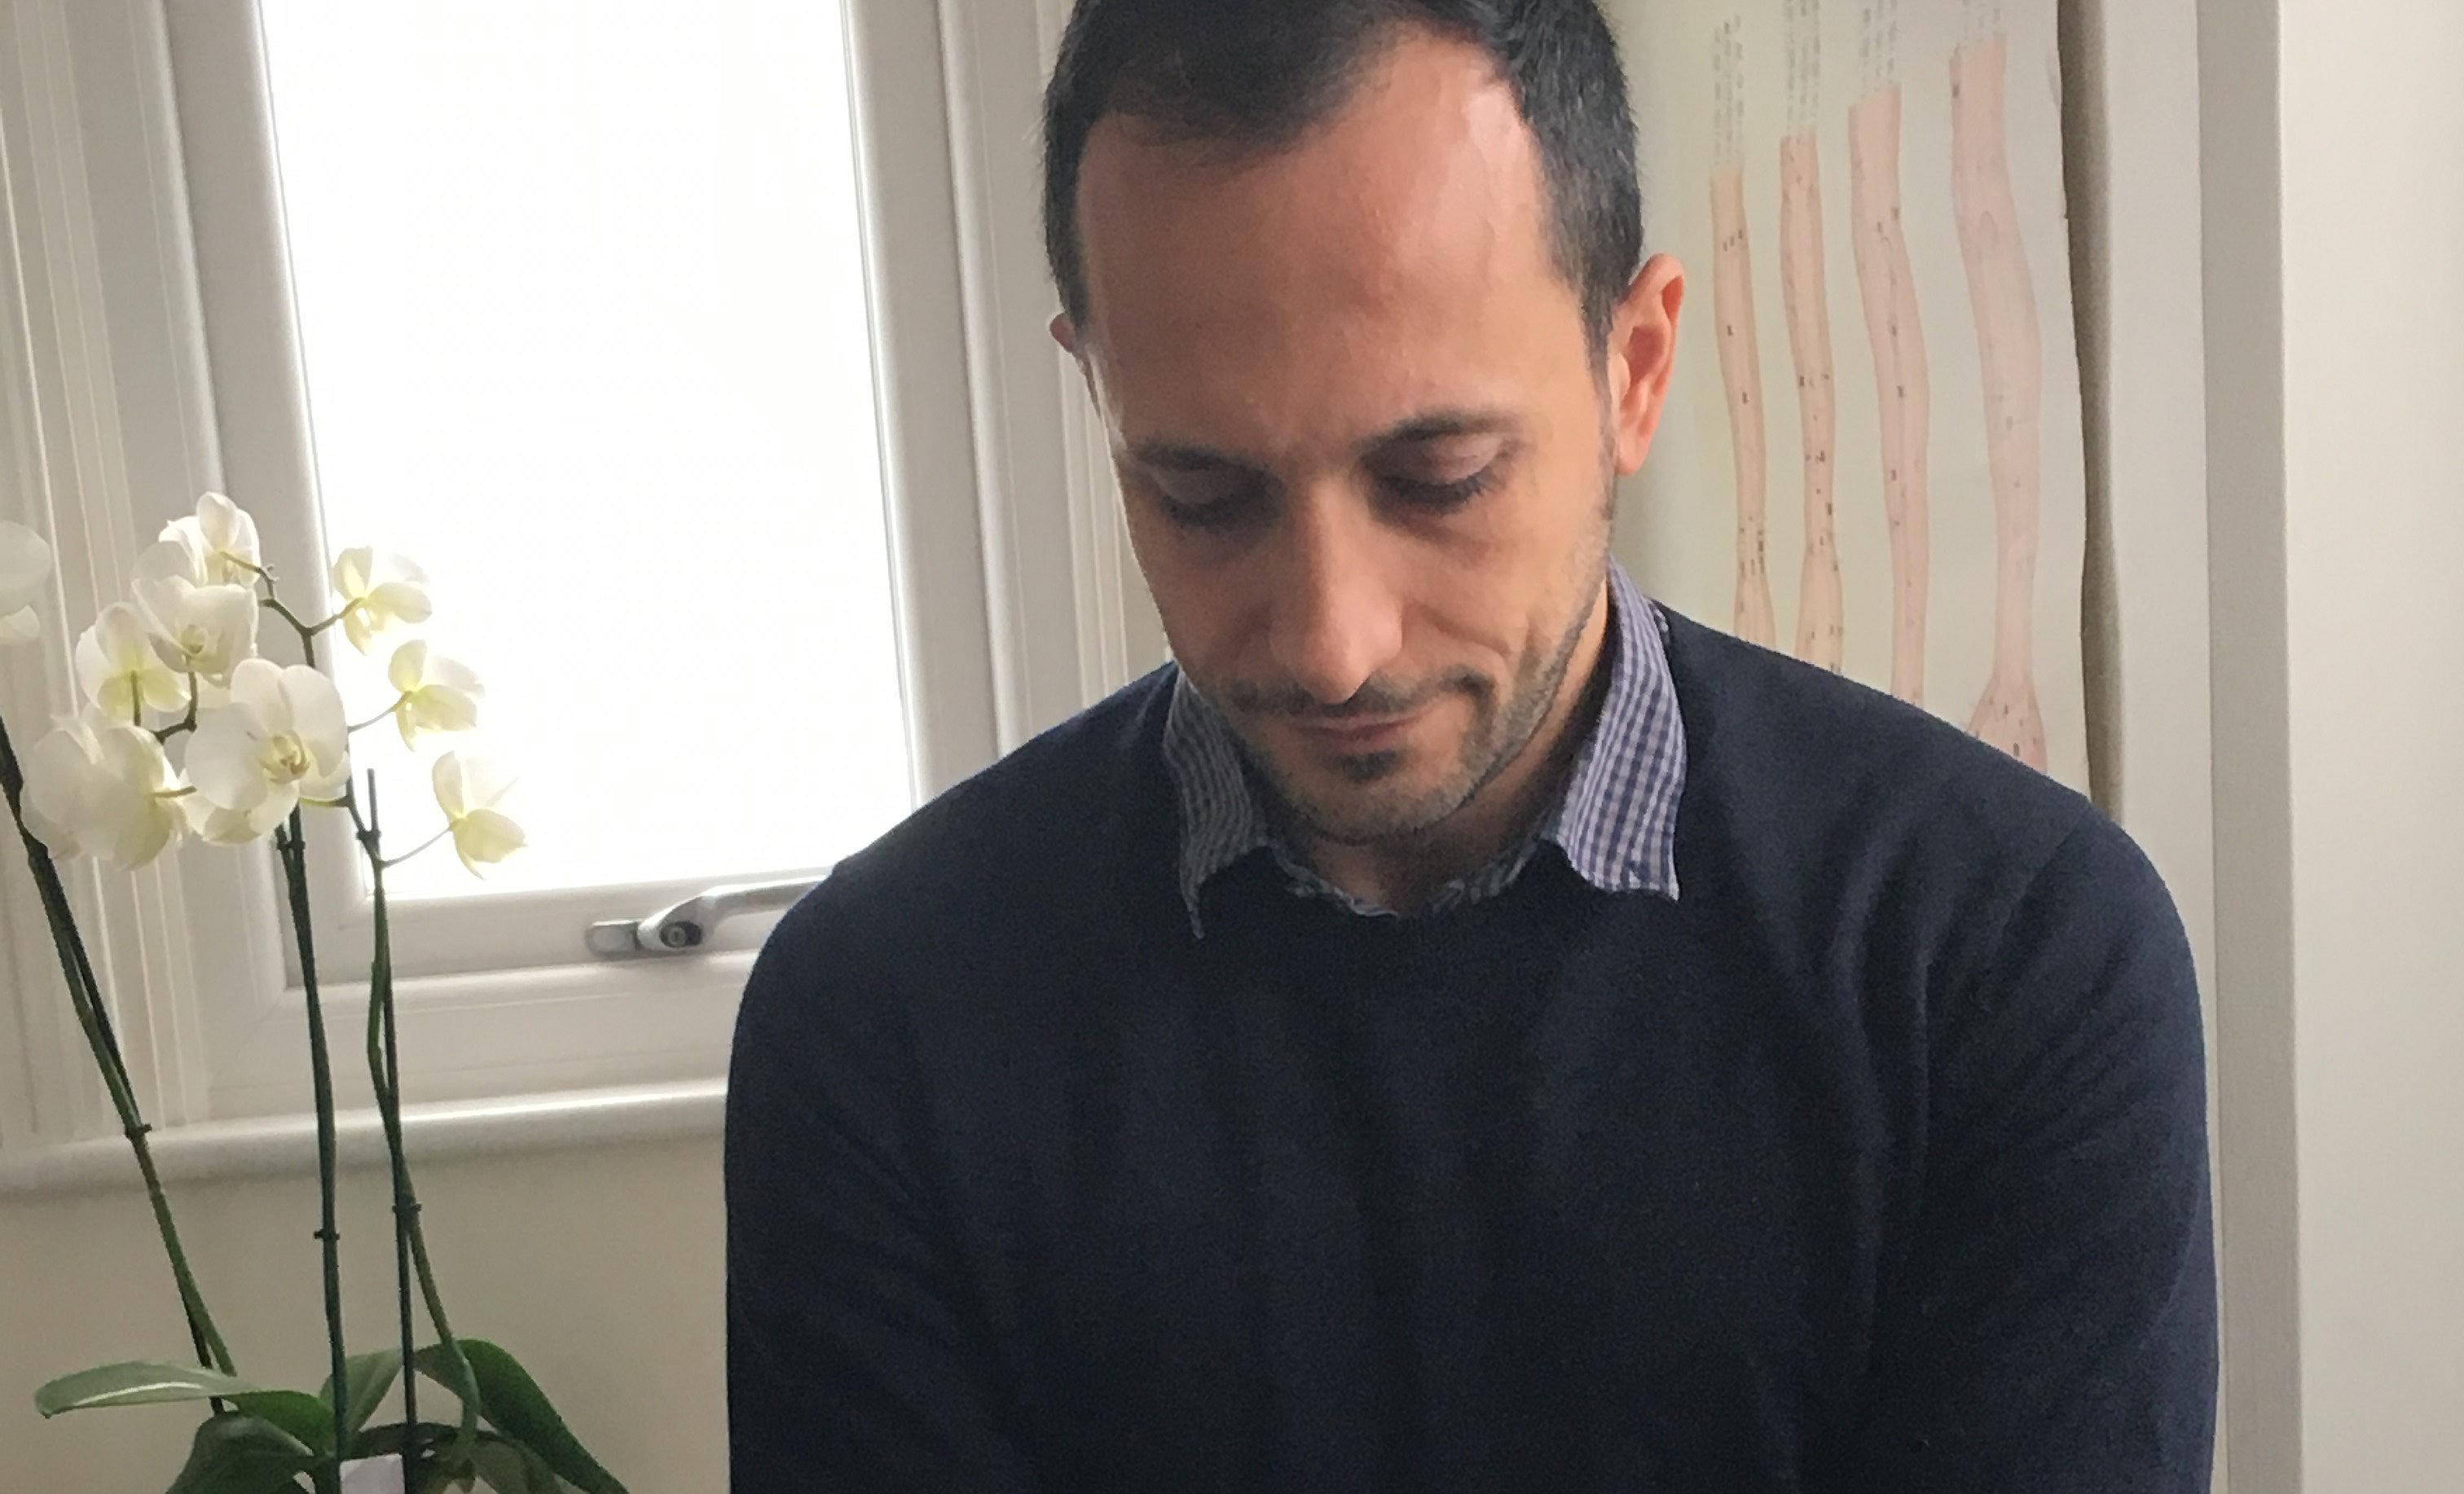 Acupuncturist and massage therapist Pouyan Salimian